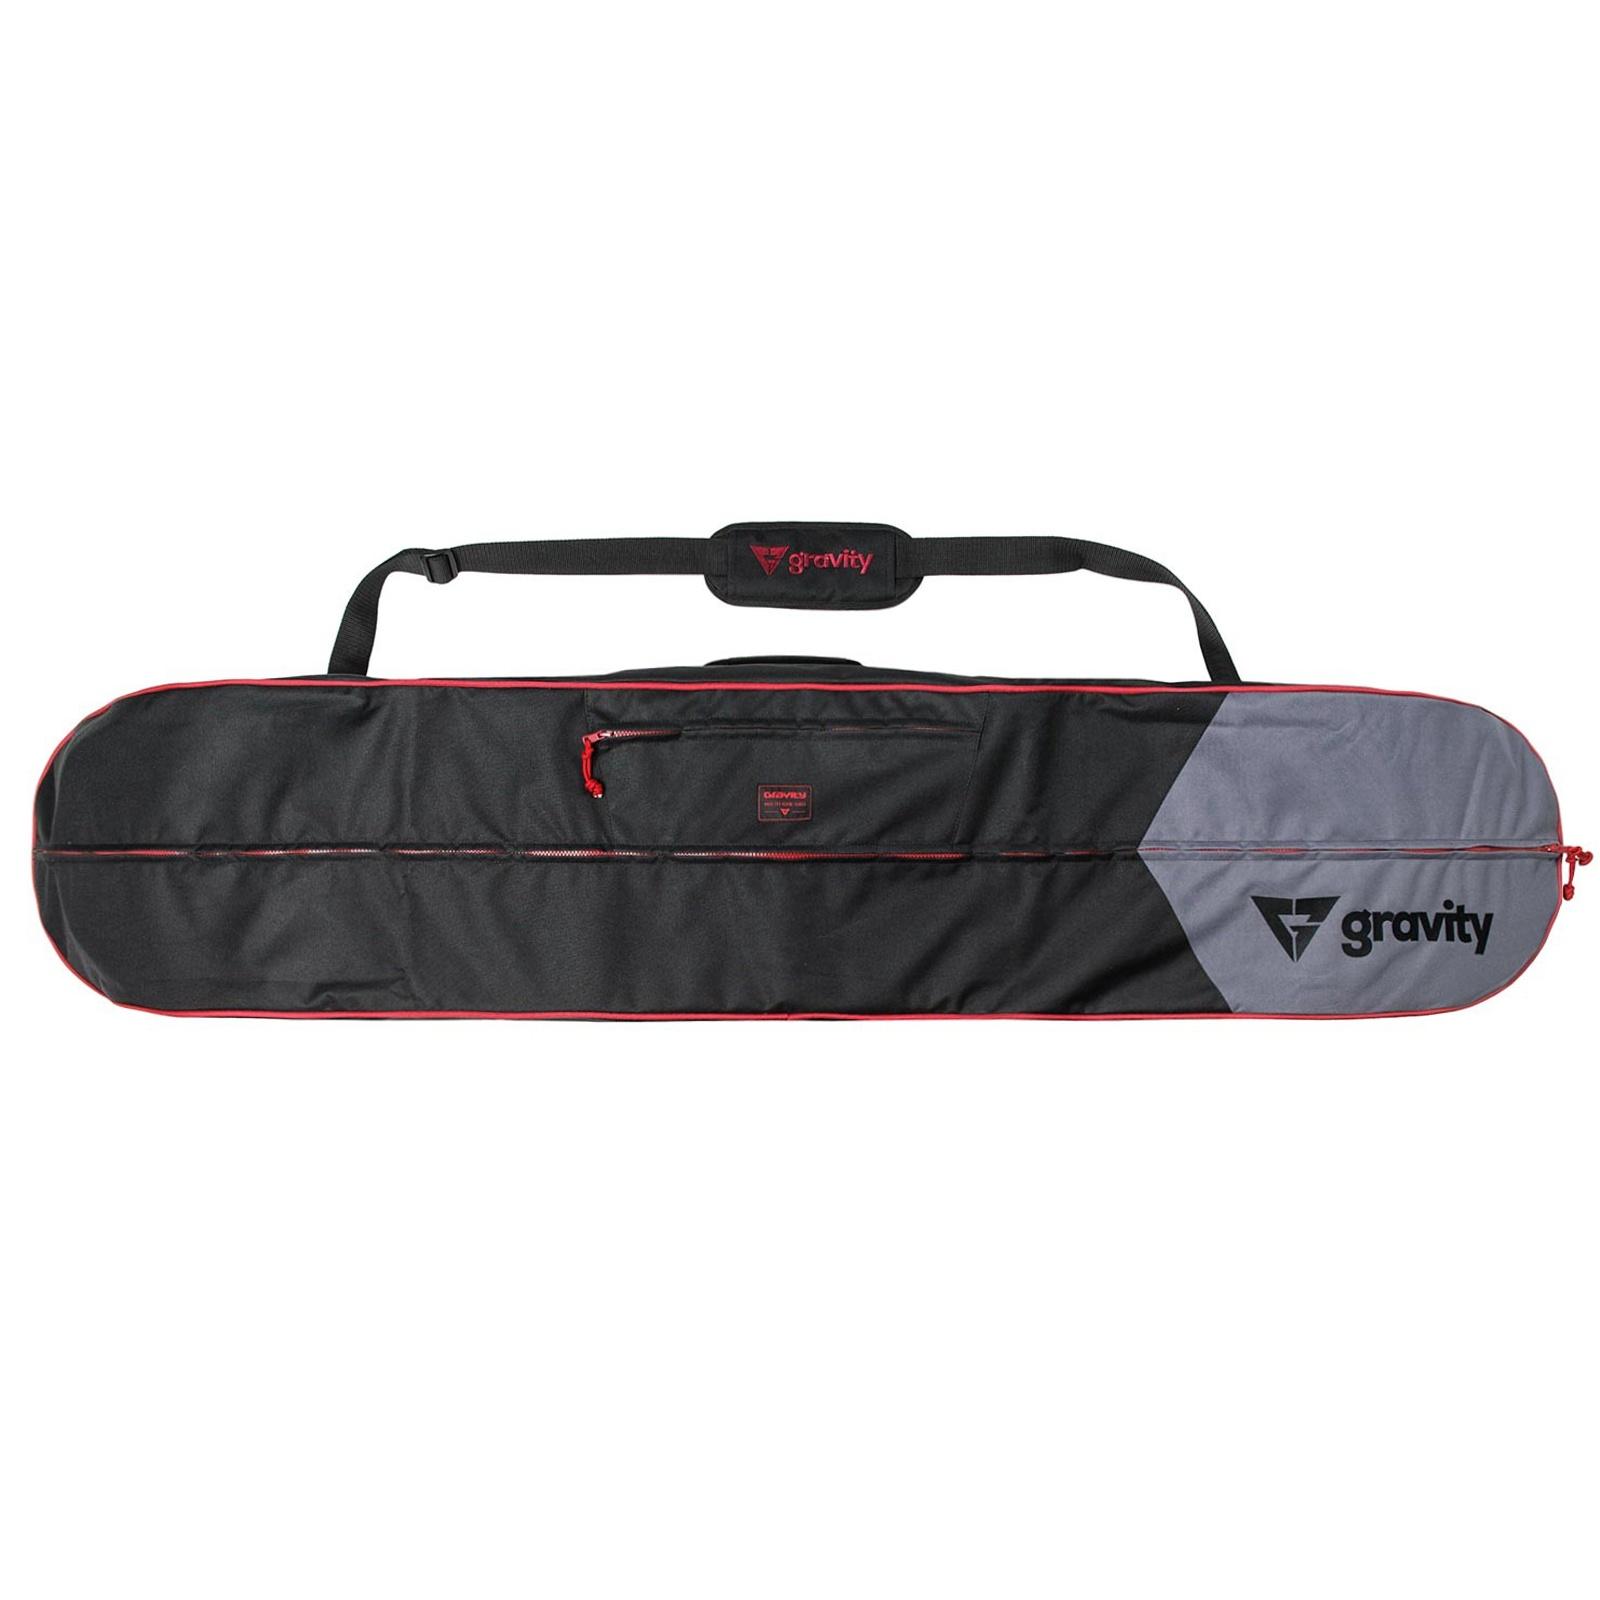 Obal na snowboard GRAVITY Icon černo-červený - vel. 155 cm